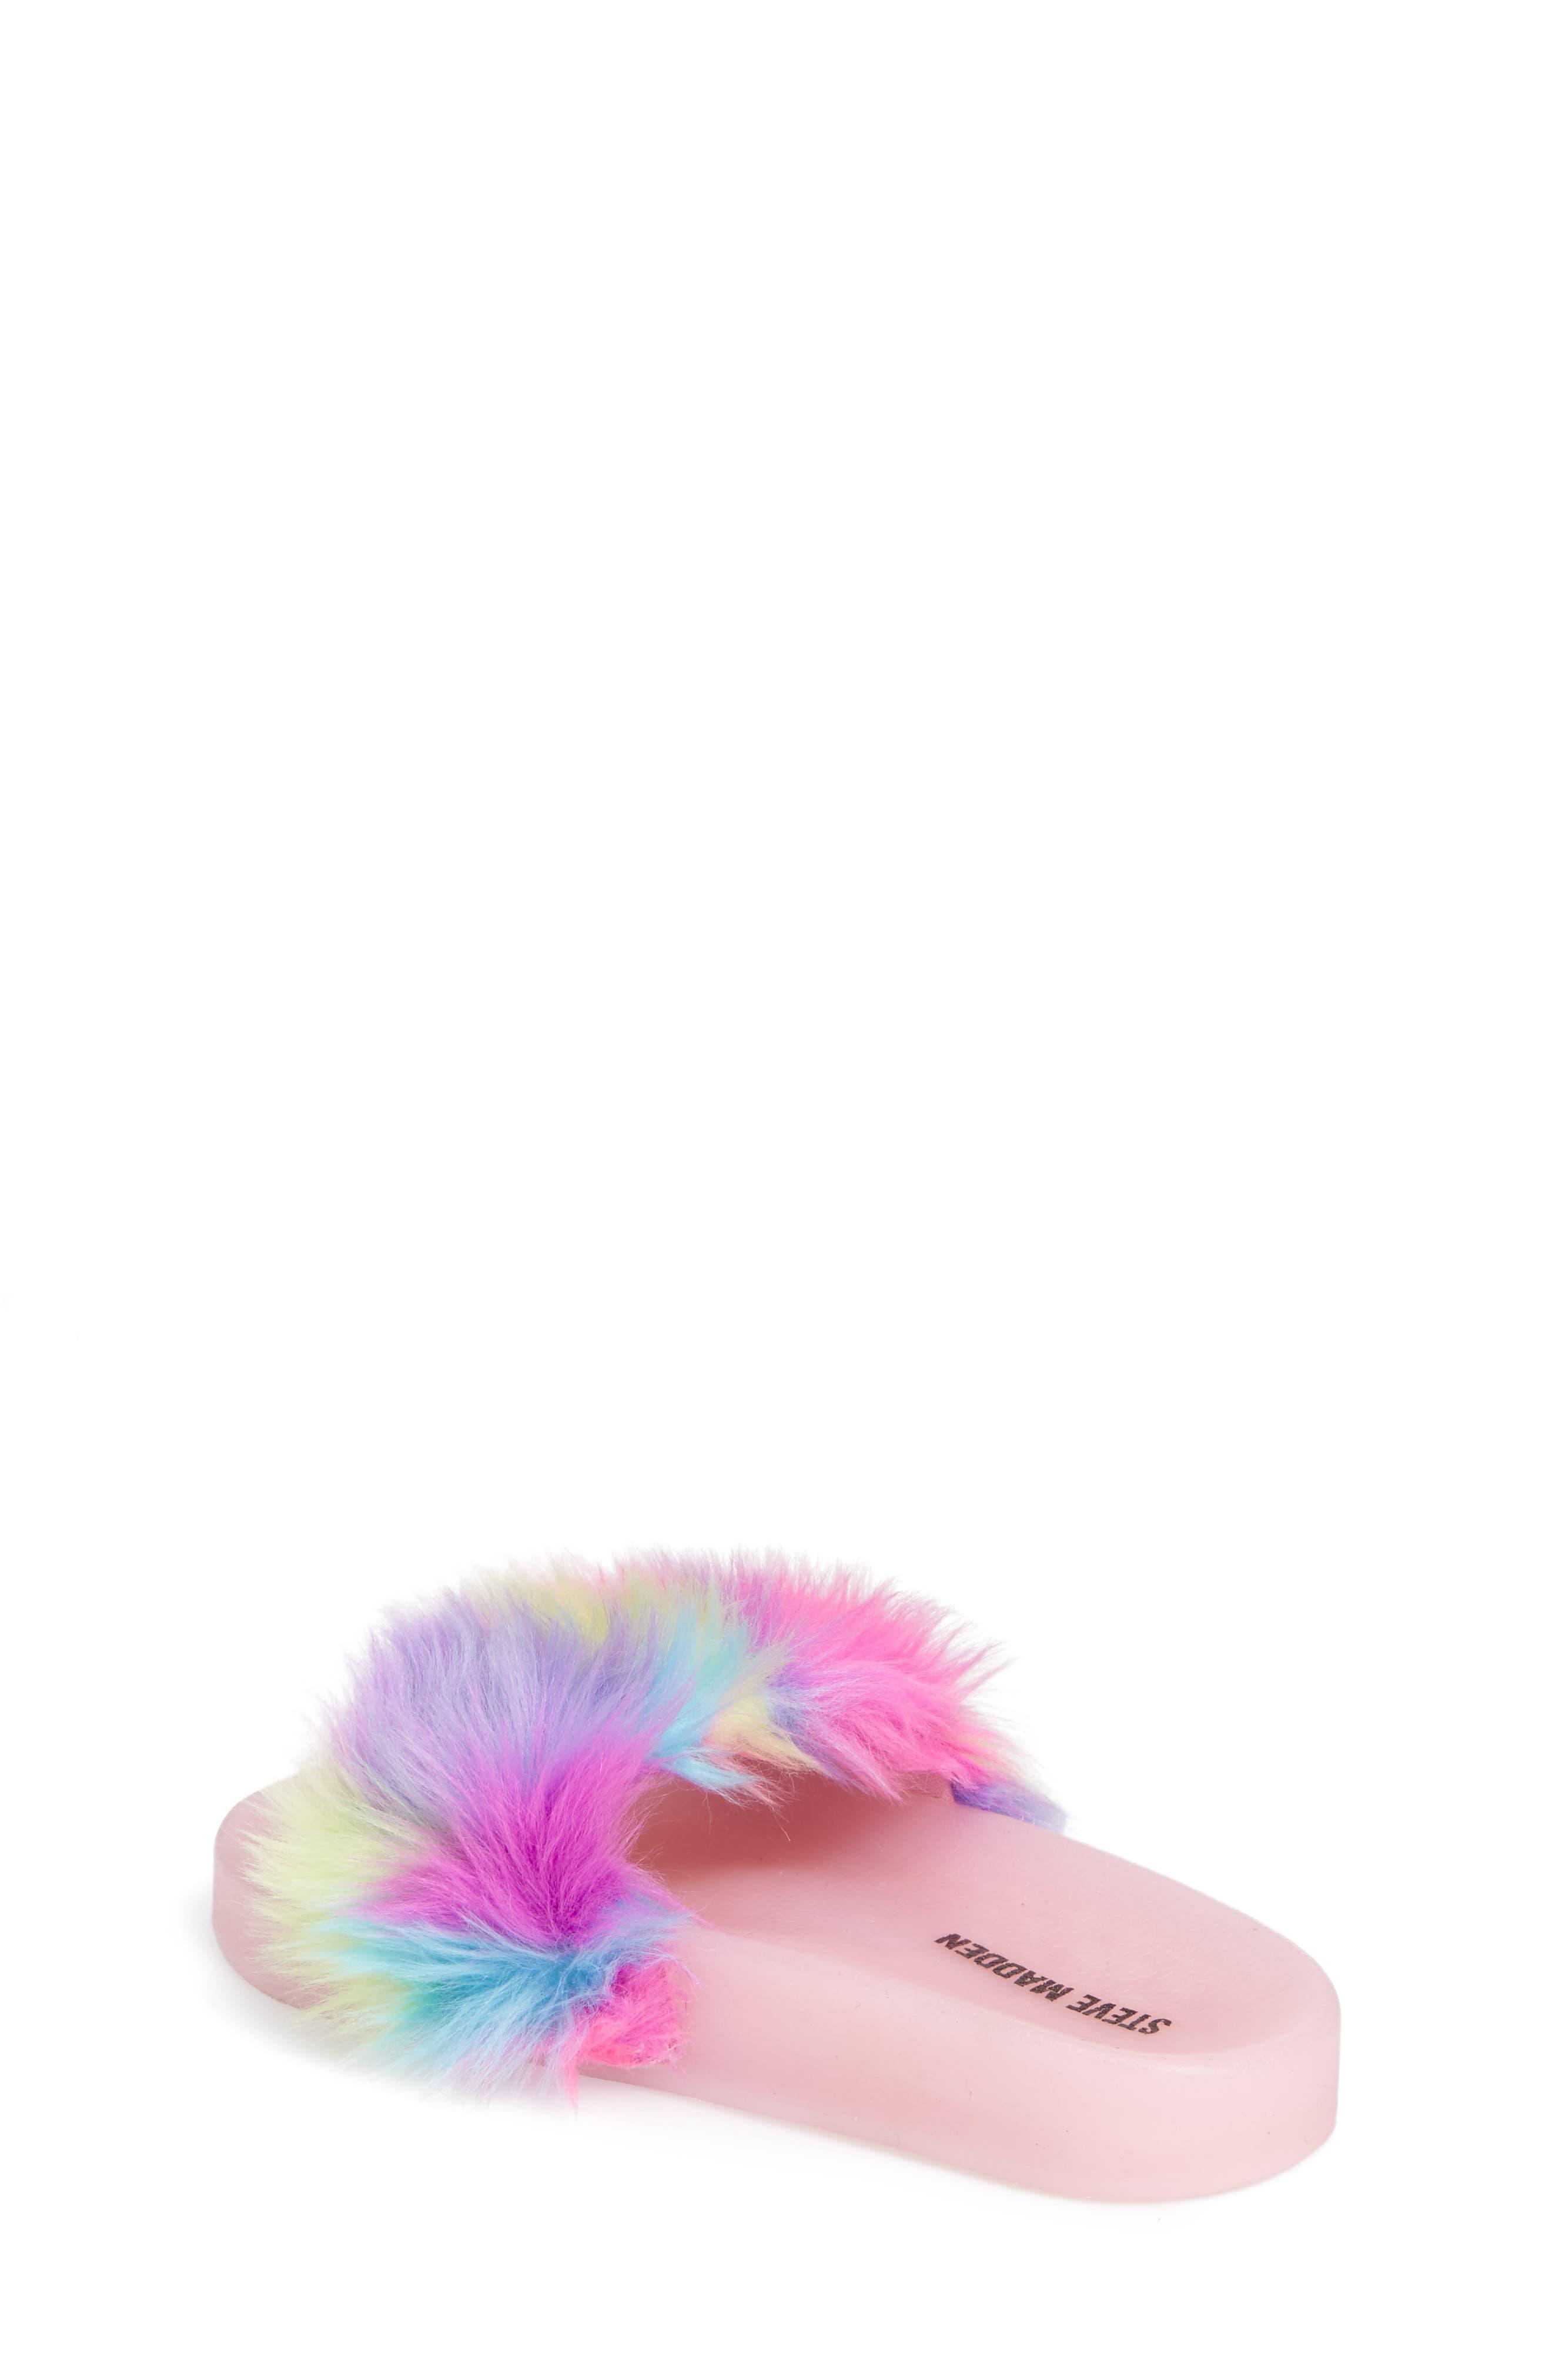 Jlights Faux Fur Light-Up Slide Sandal,                             Alternate thumbnail 2, color,                             Multi